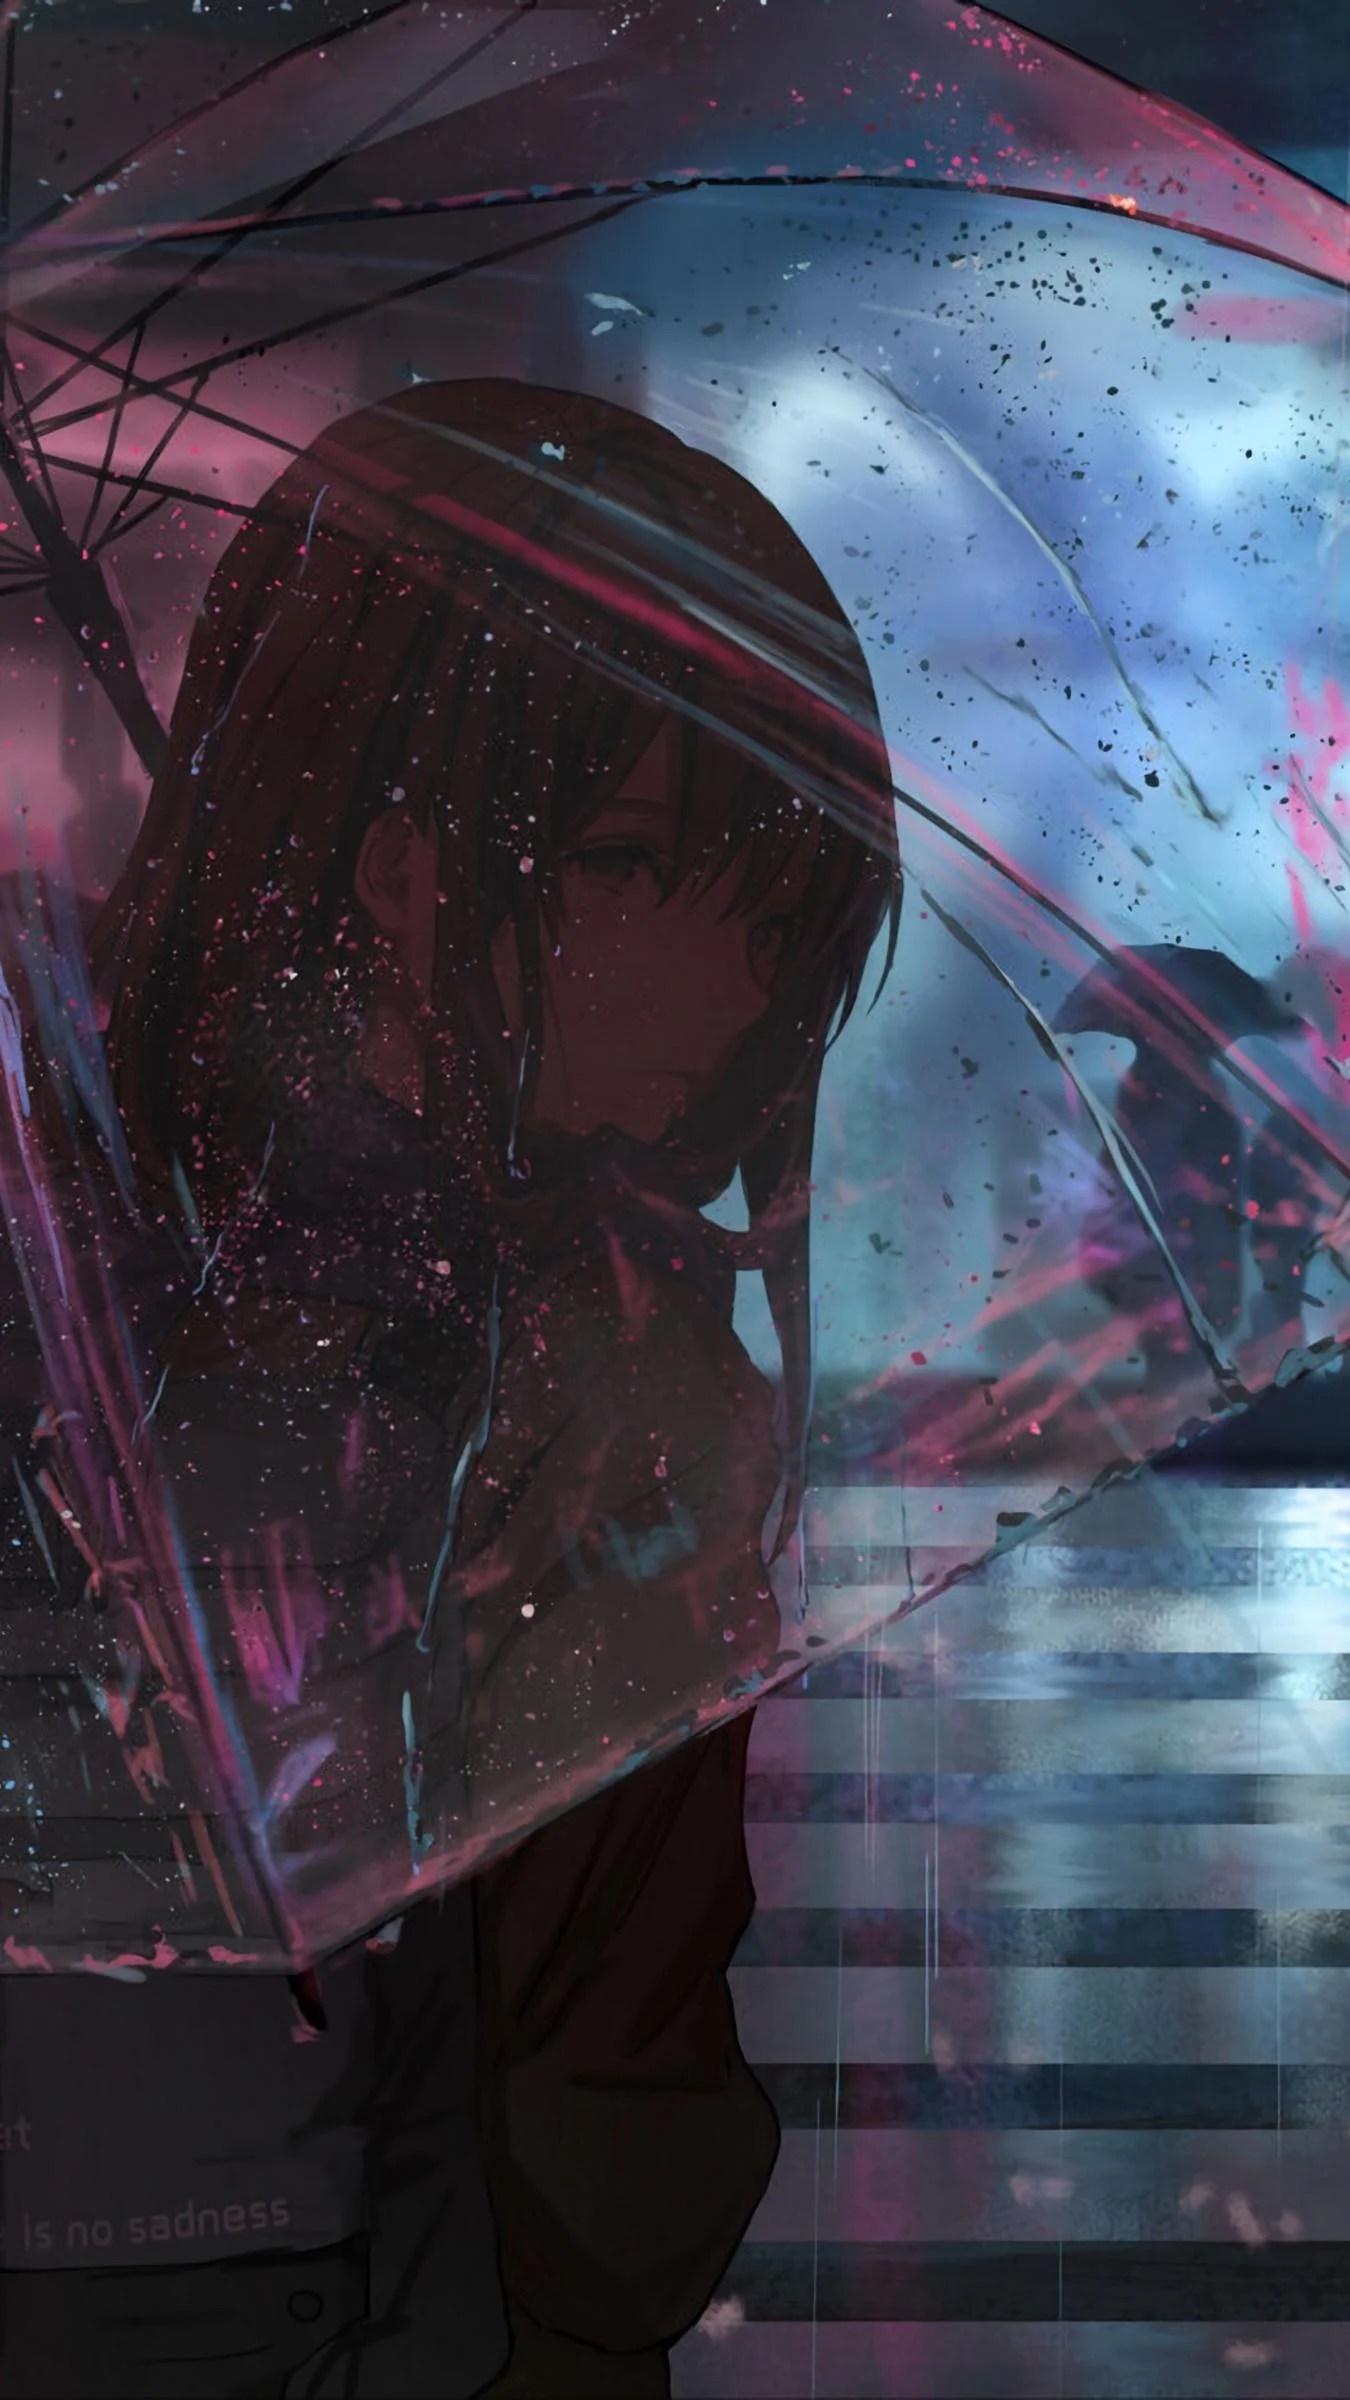 Sad Anime Wallpaper Phone : anime, wallpaper, phone, Anime, IPhone, Wallpapers, Wallpaper